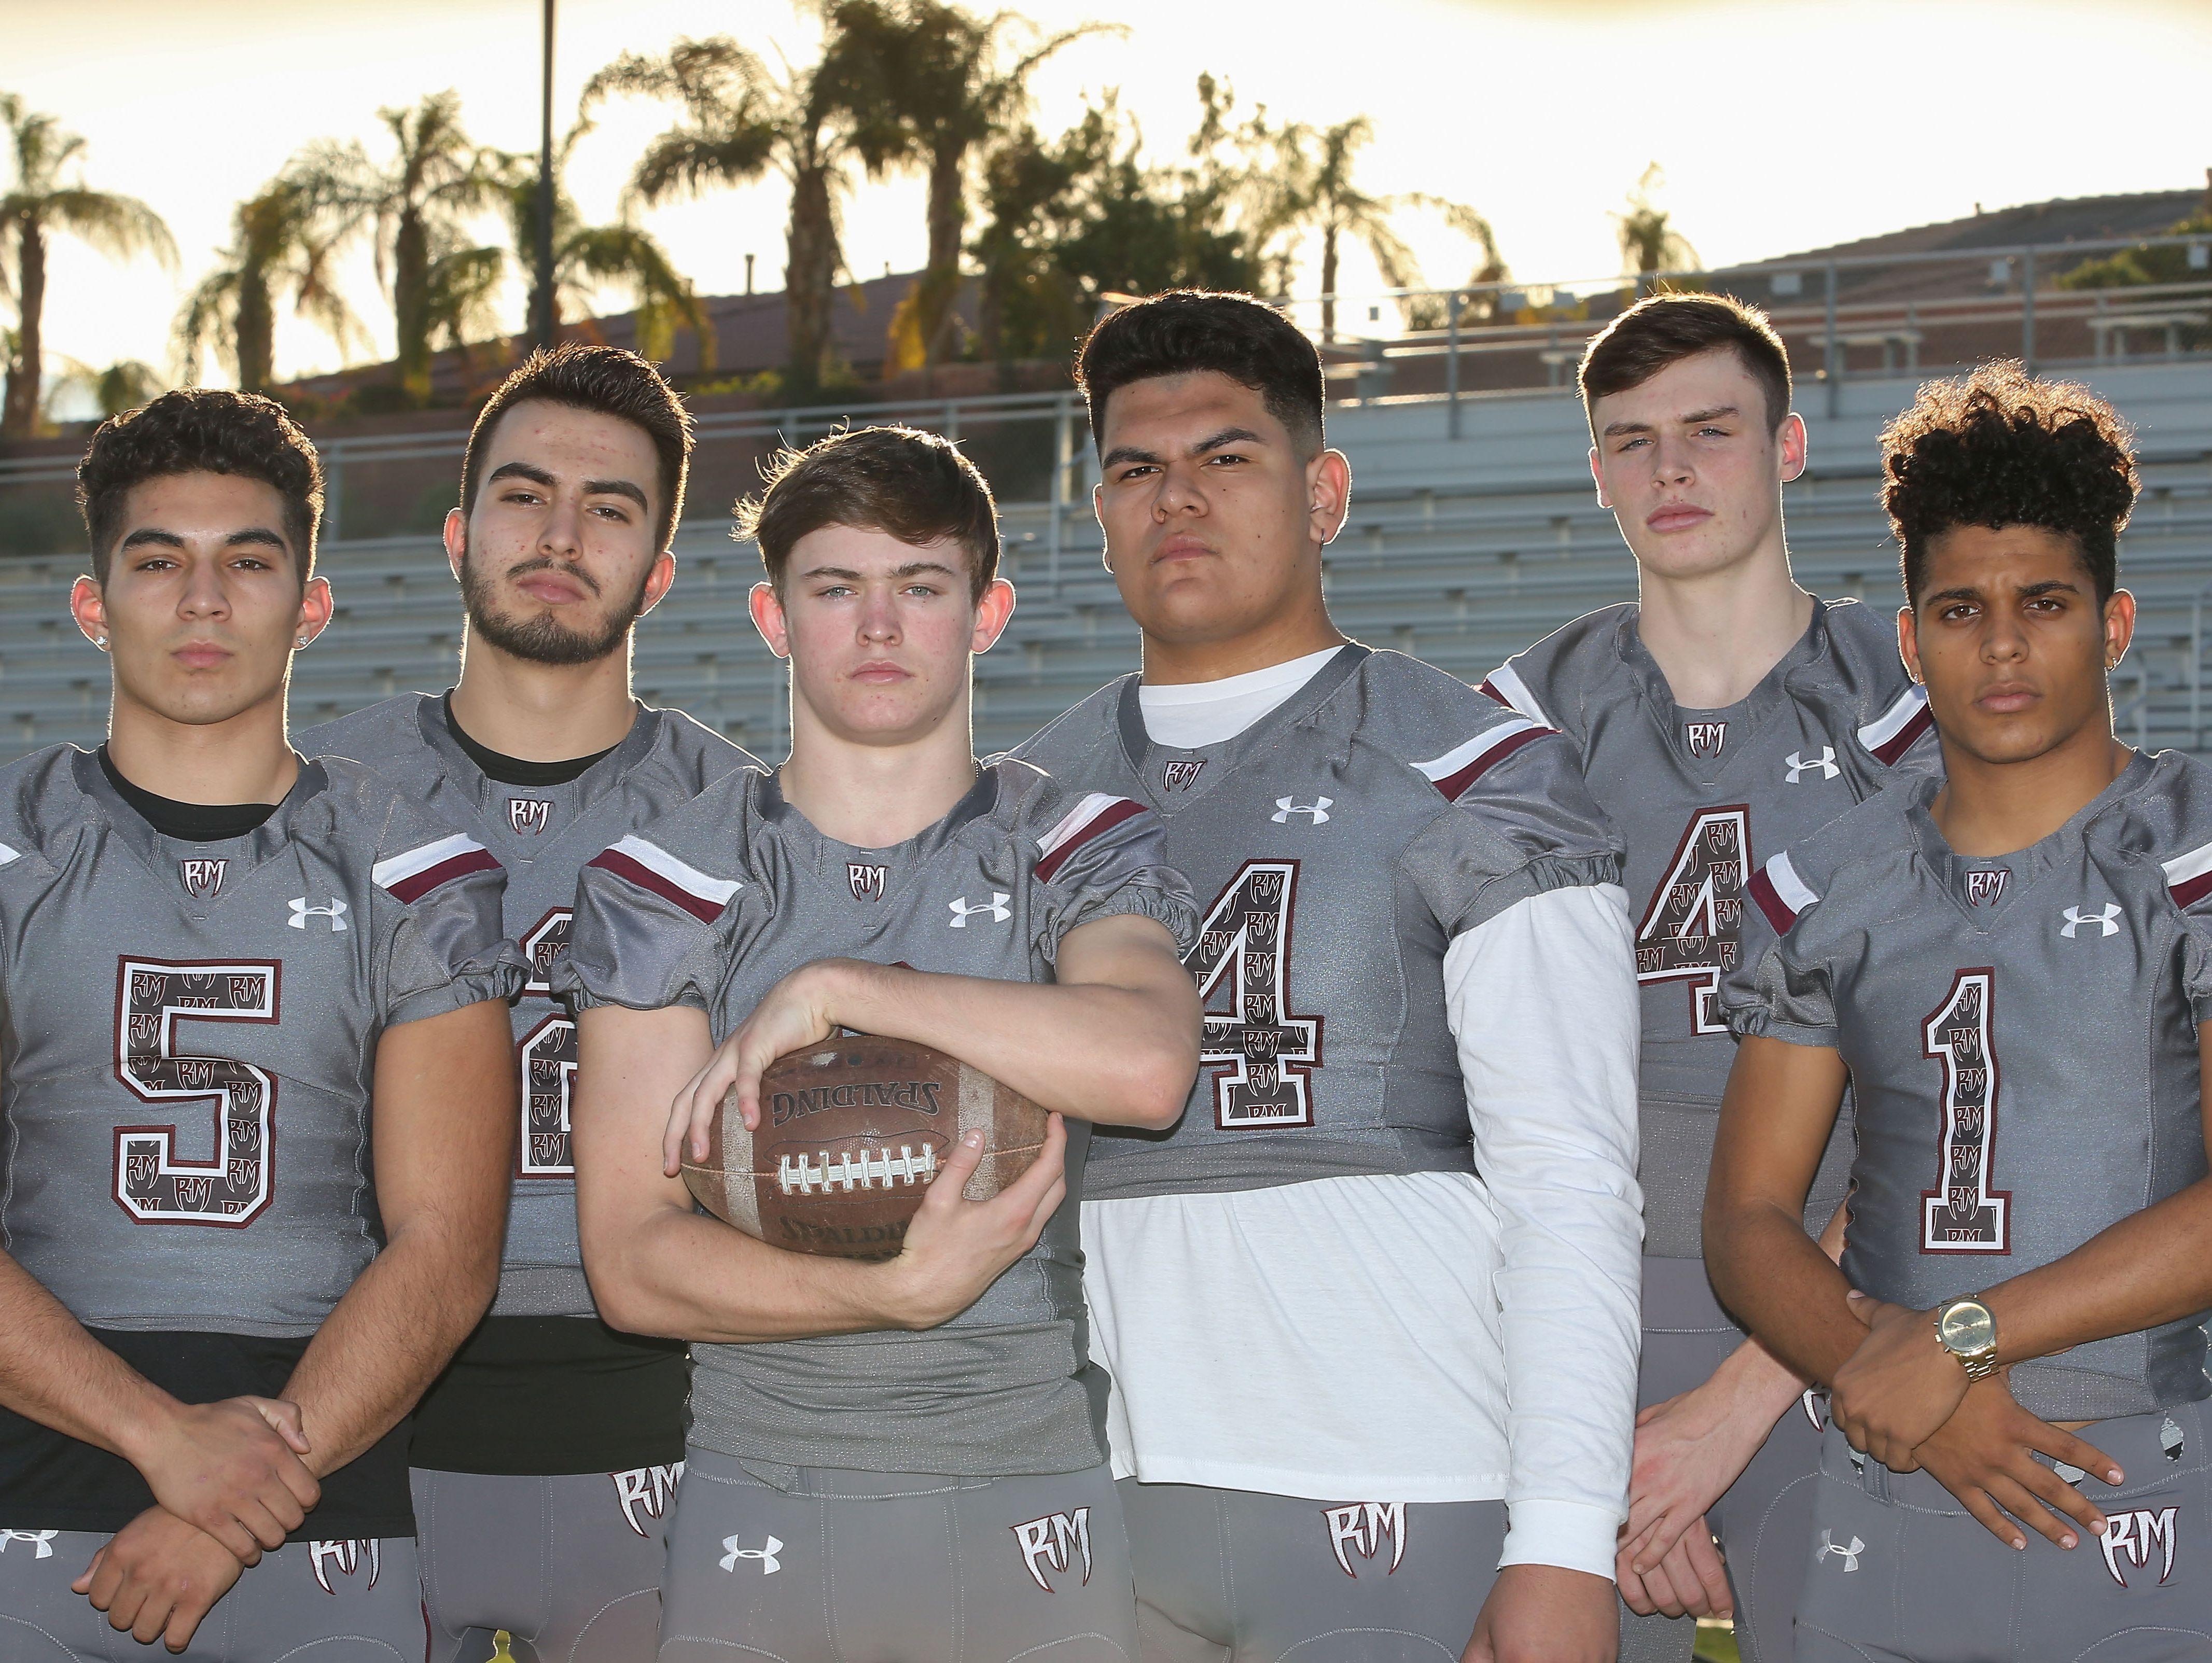 From right; Marques Prior, Daniel Whelan, Jonny Avila, Kyle Whitefield, Josh Ramirez and Mikey Ramos of the Rancho Mirage High School football team.